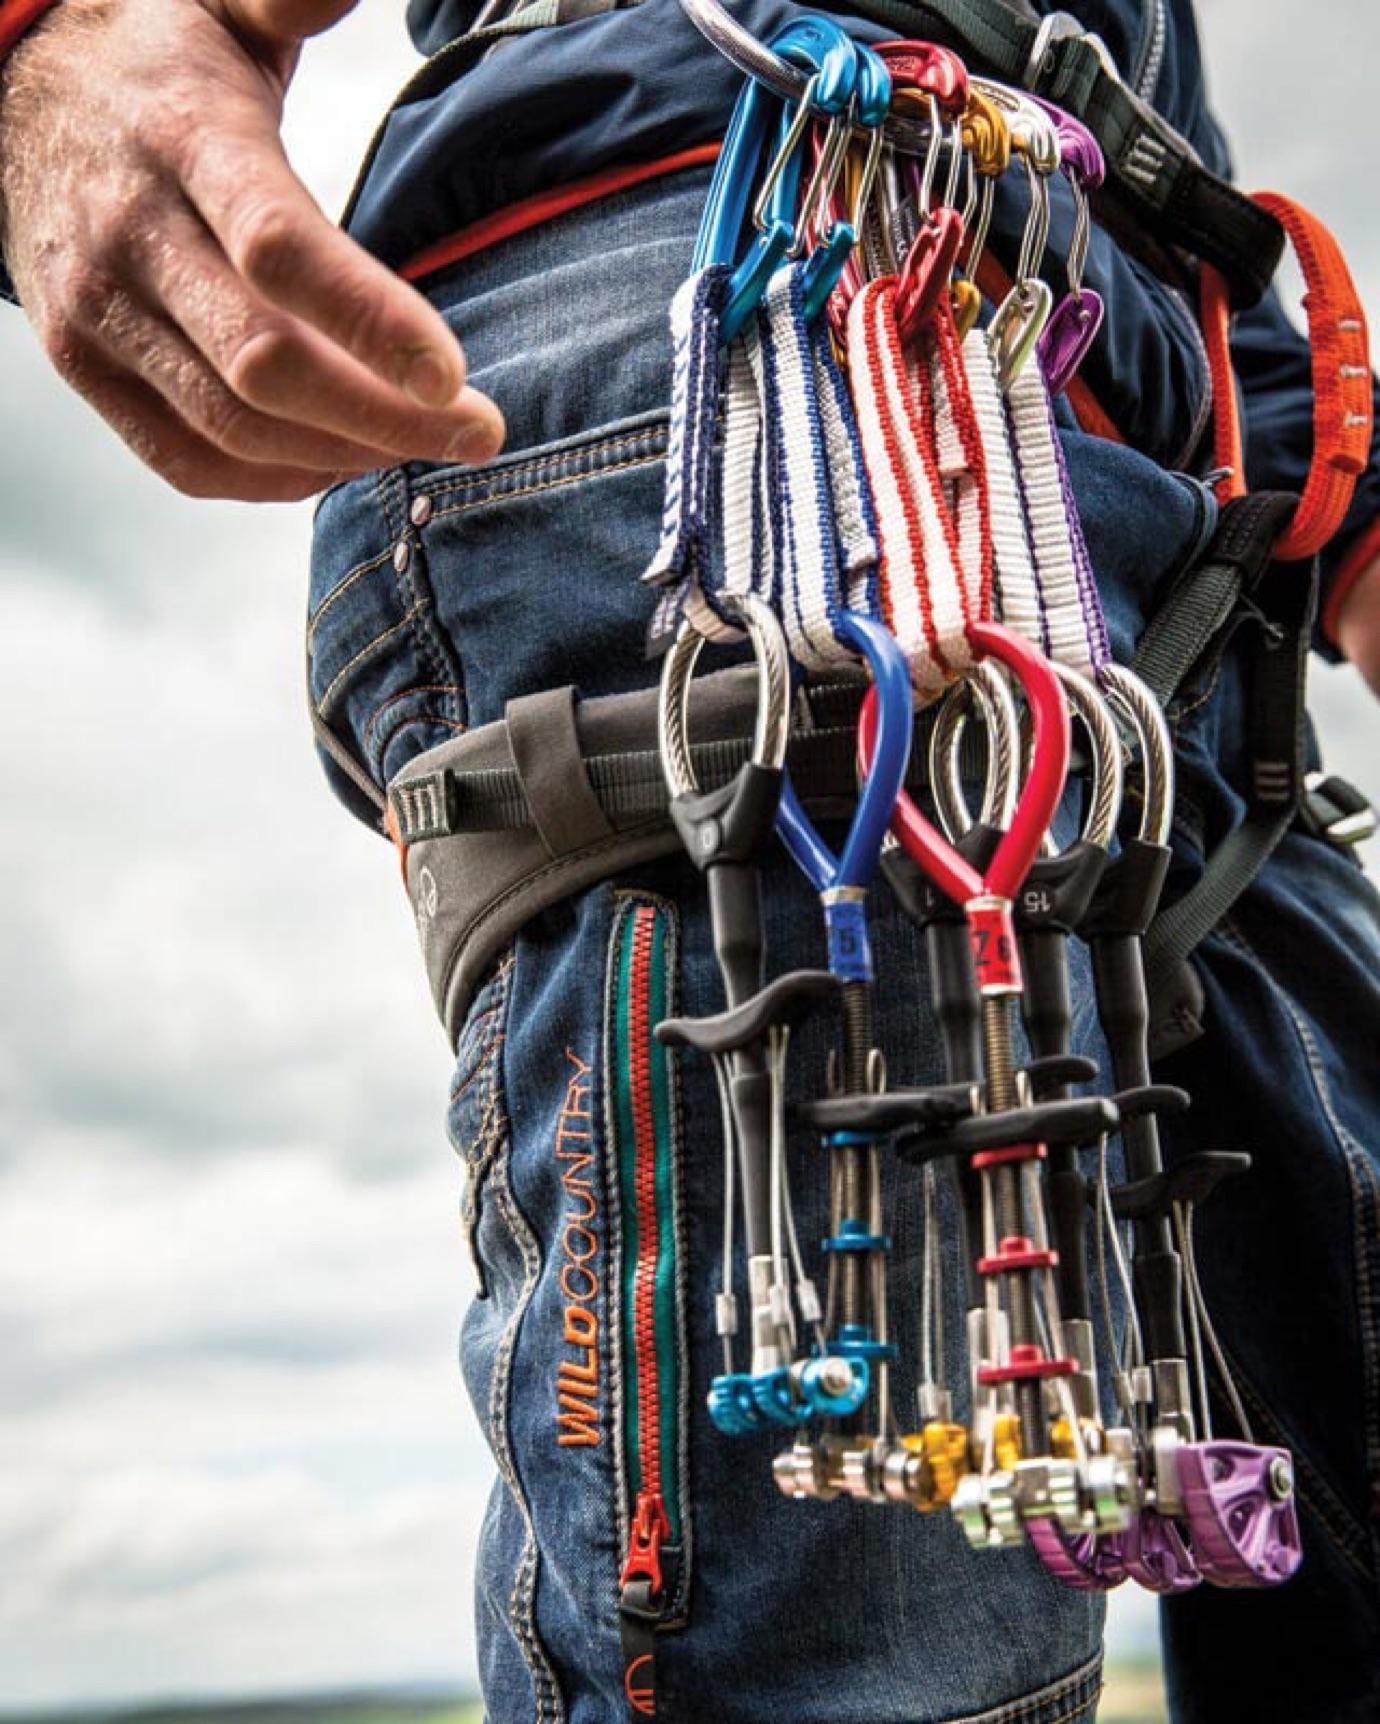 Climber's set of carabinershung around their waist